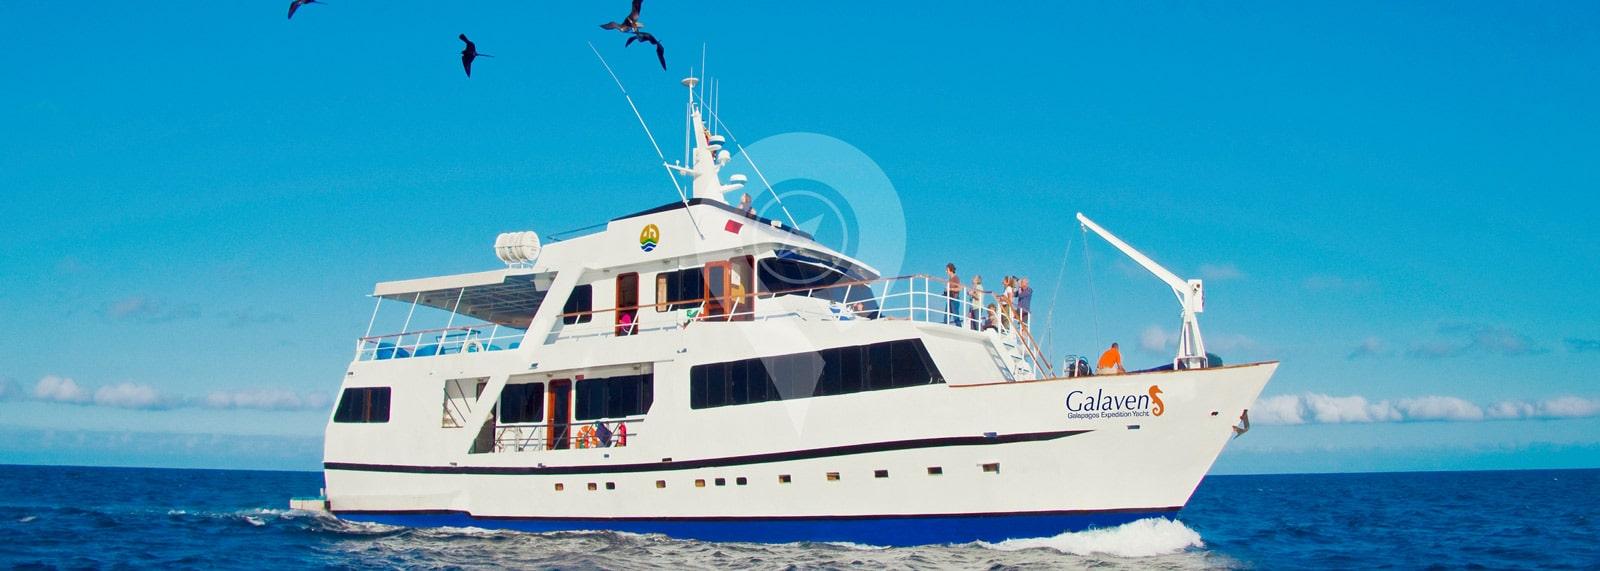 Galaven Galapagos Yacht